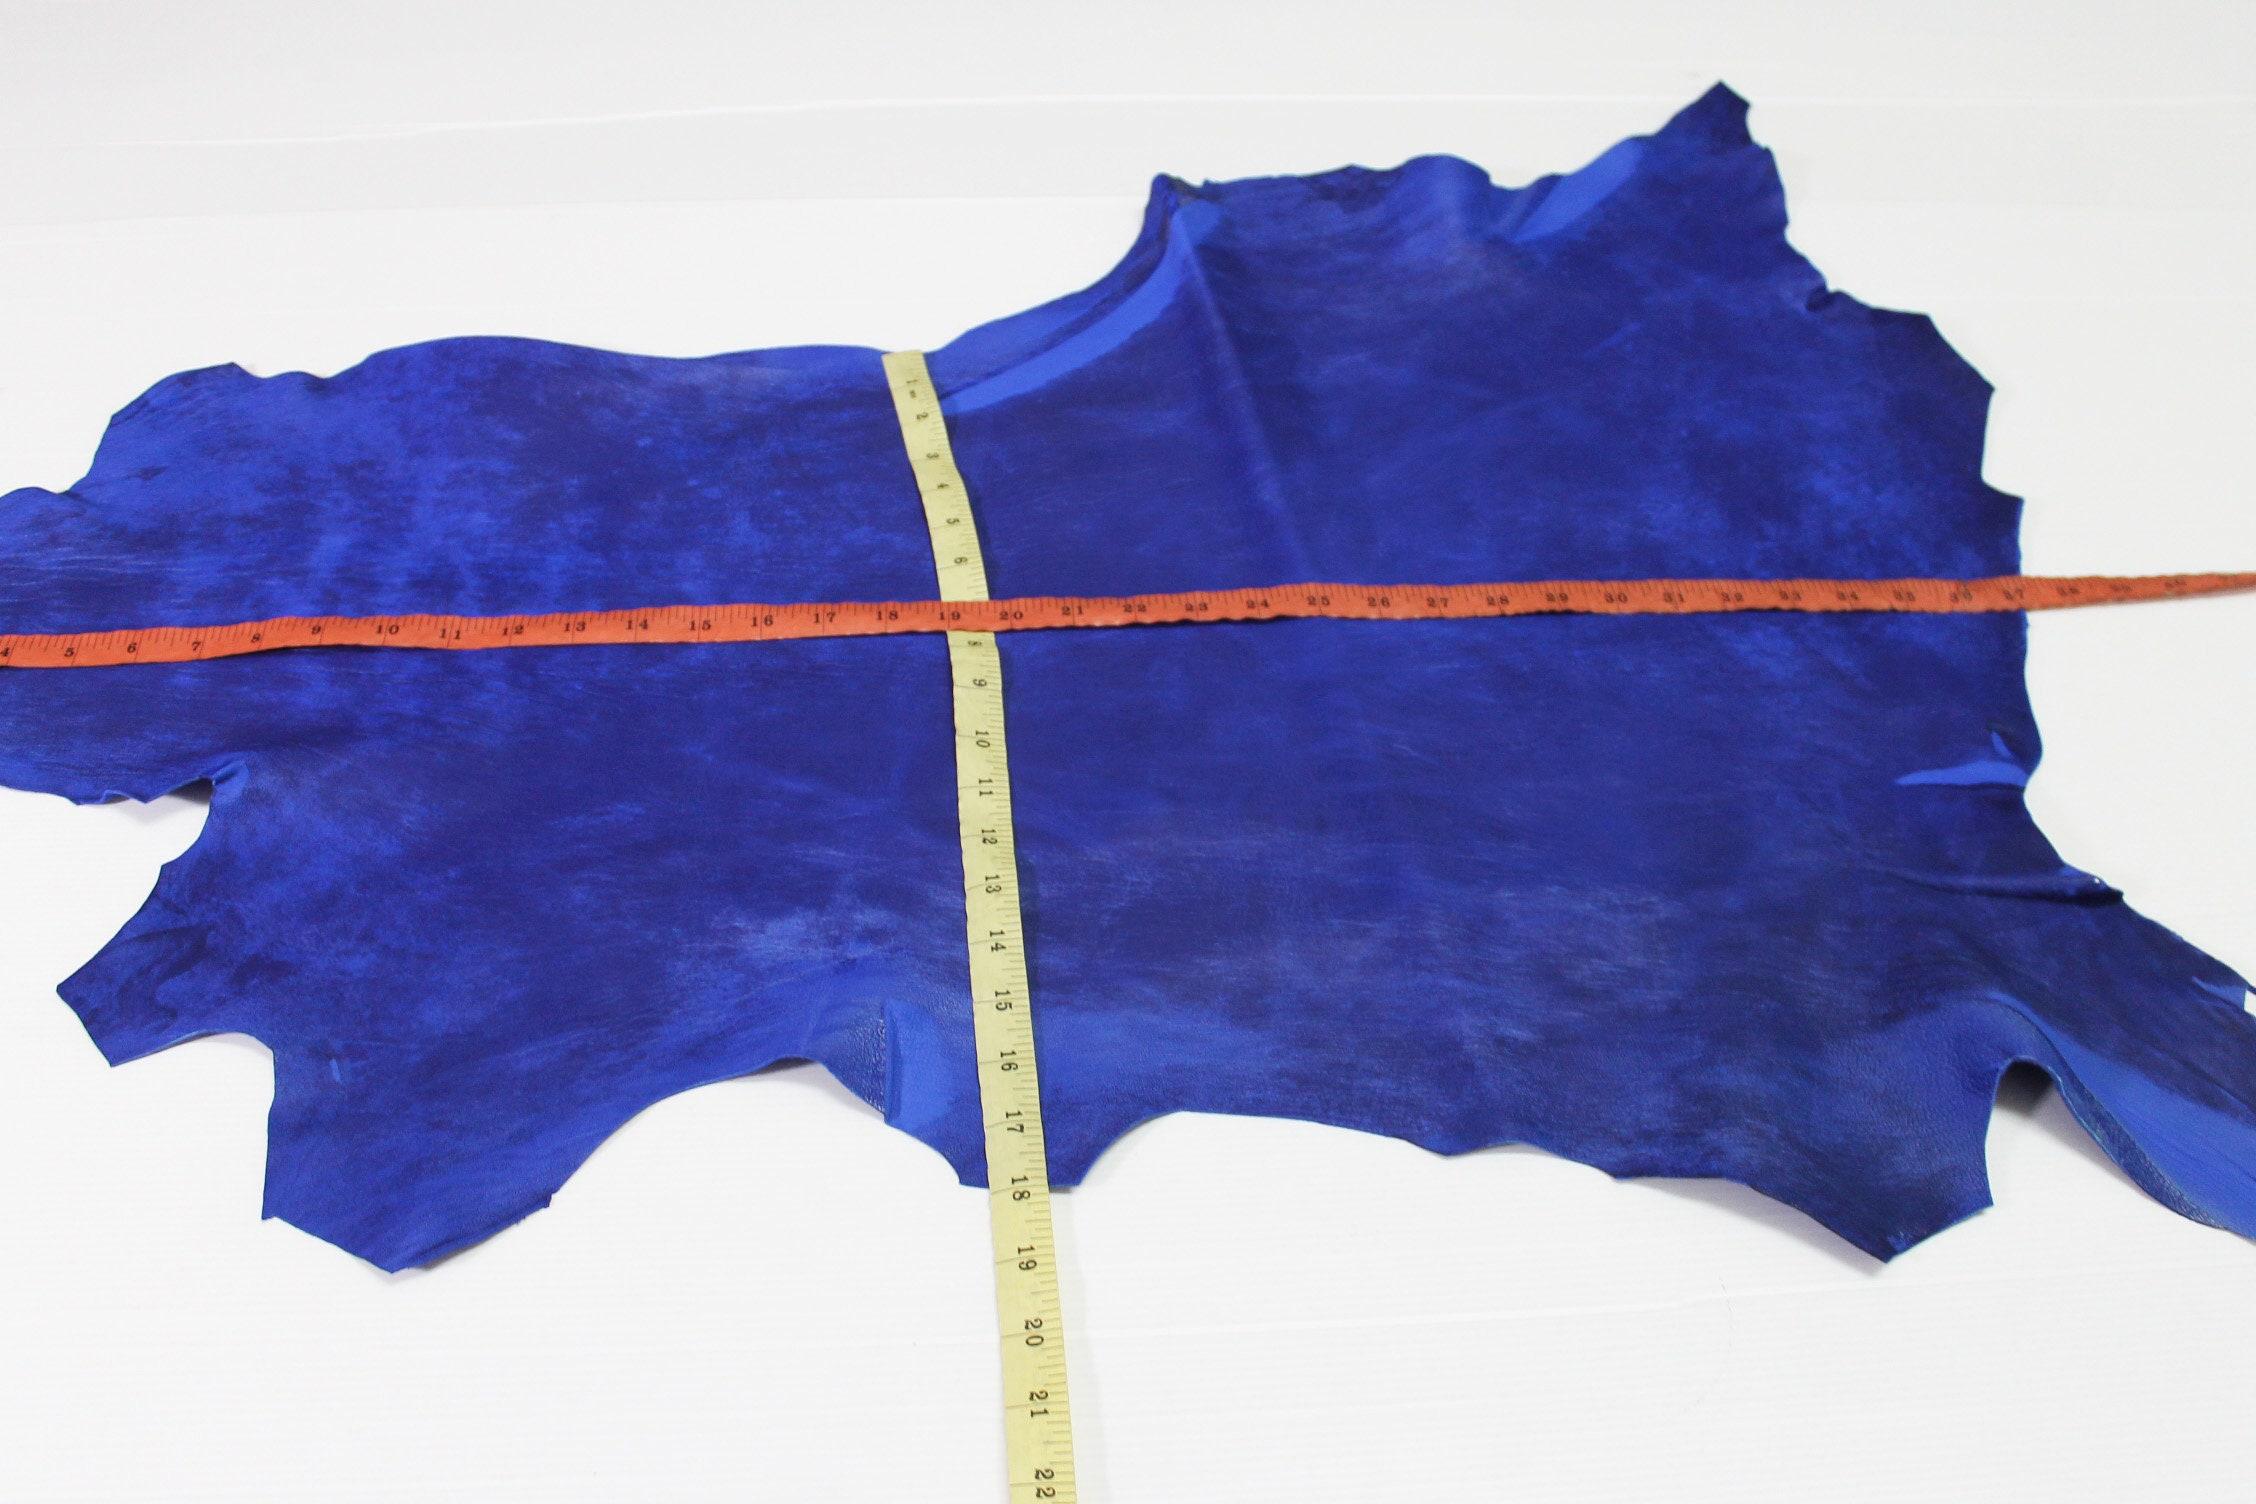 68dc724c1eae ROYAL BLUE DISTRESSED textured thick vegetable tan Italian genuine Lambskin  Lamb Sheep leather skin hide skins hides 5sqf 1.4mm  A4123